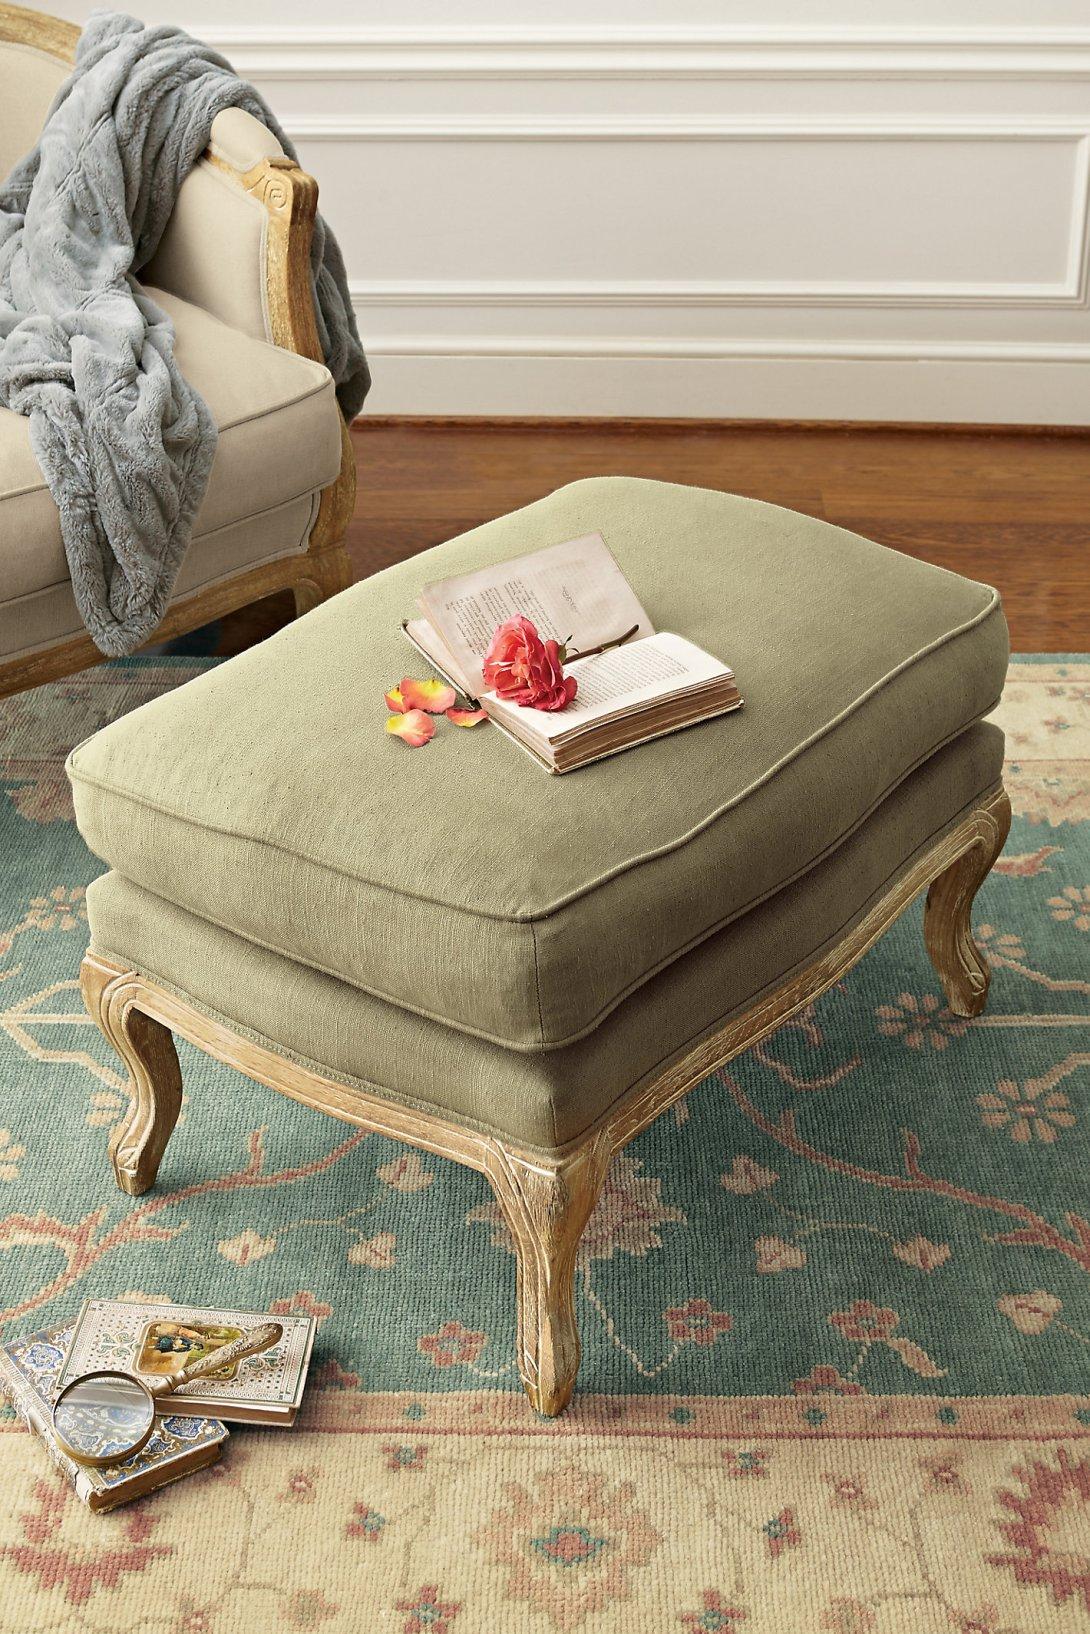 Soft Surroundings Home Decor Amp Women S Clothing Buyer